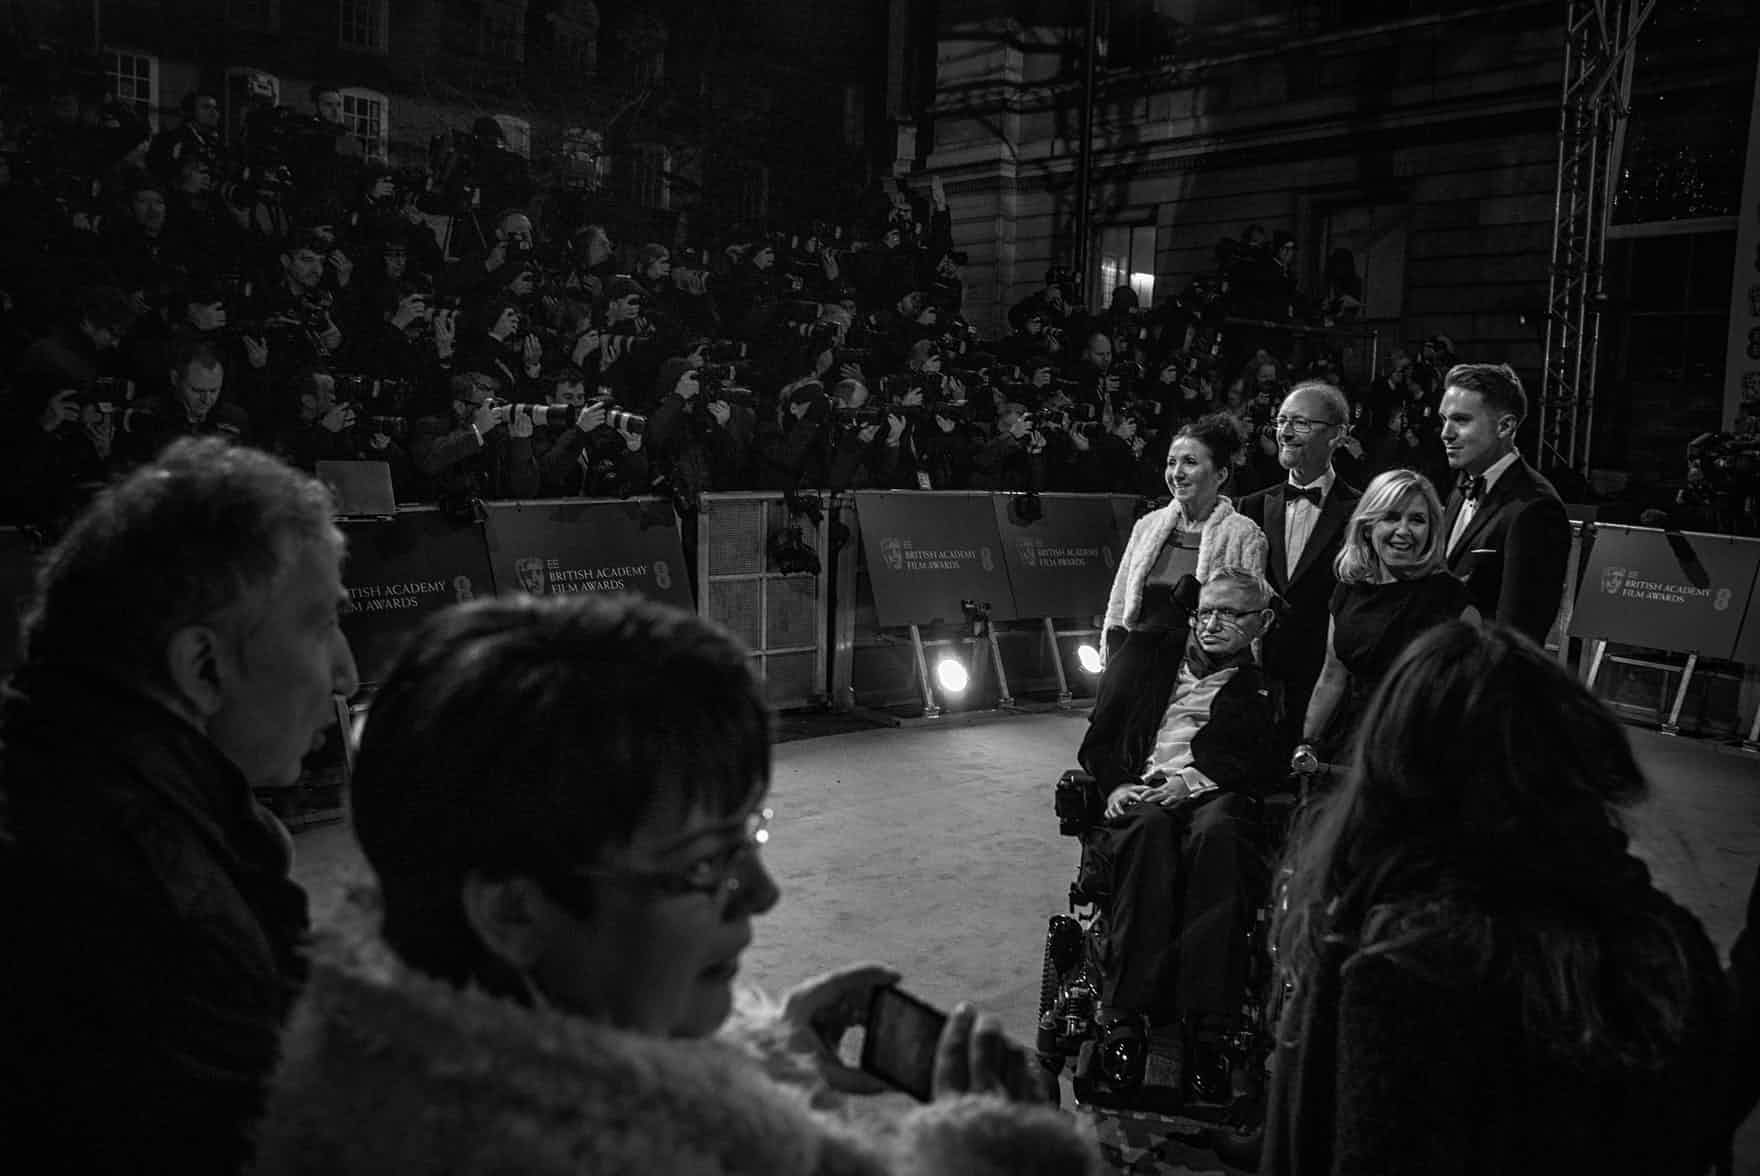 Stephen Hawking 18 -elleman